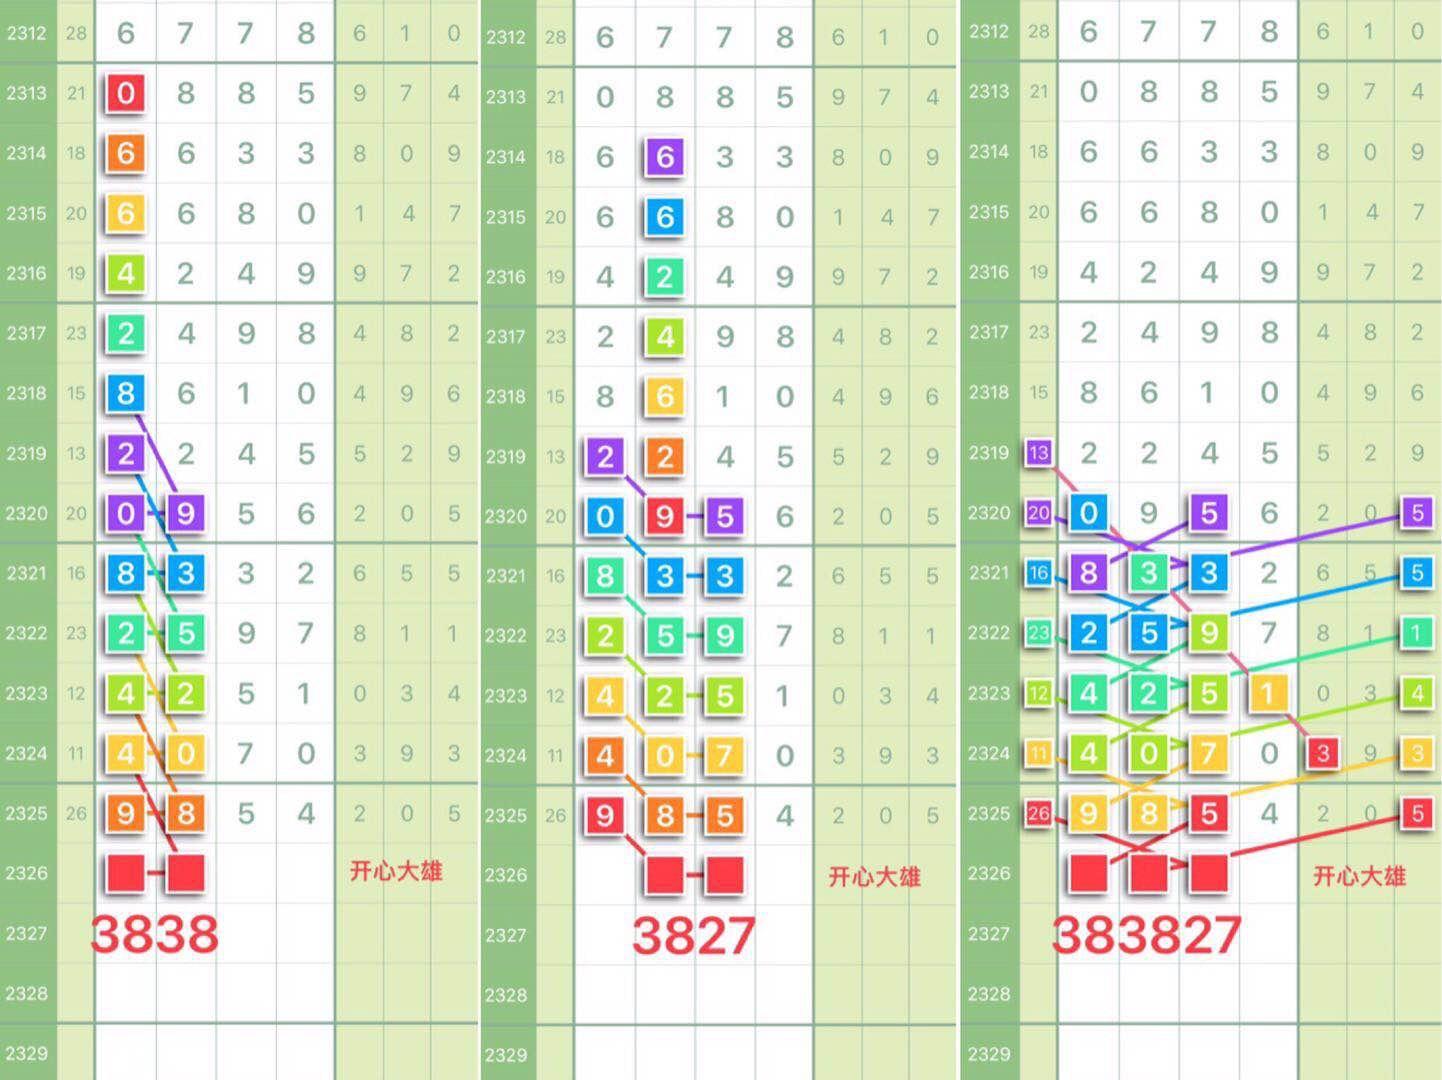 A8FF3D38-8956-4F06-BACD-AB46E1C9095C.jpeg